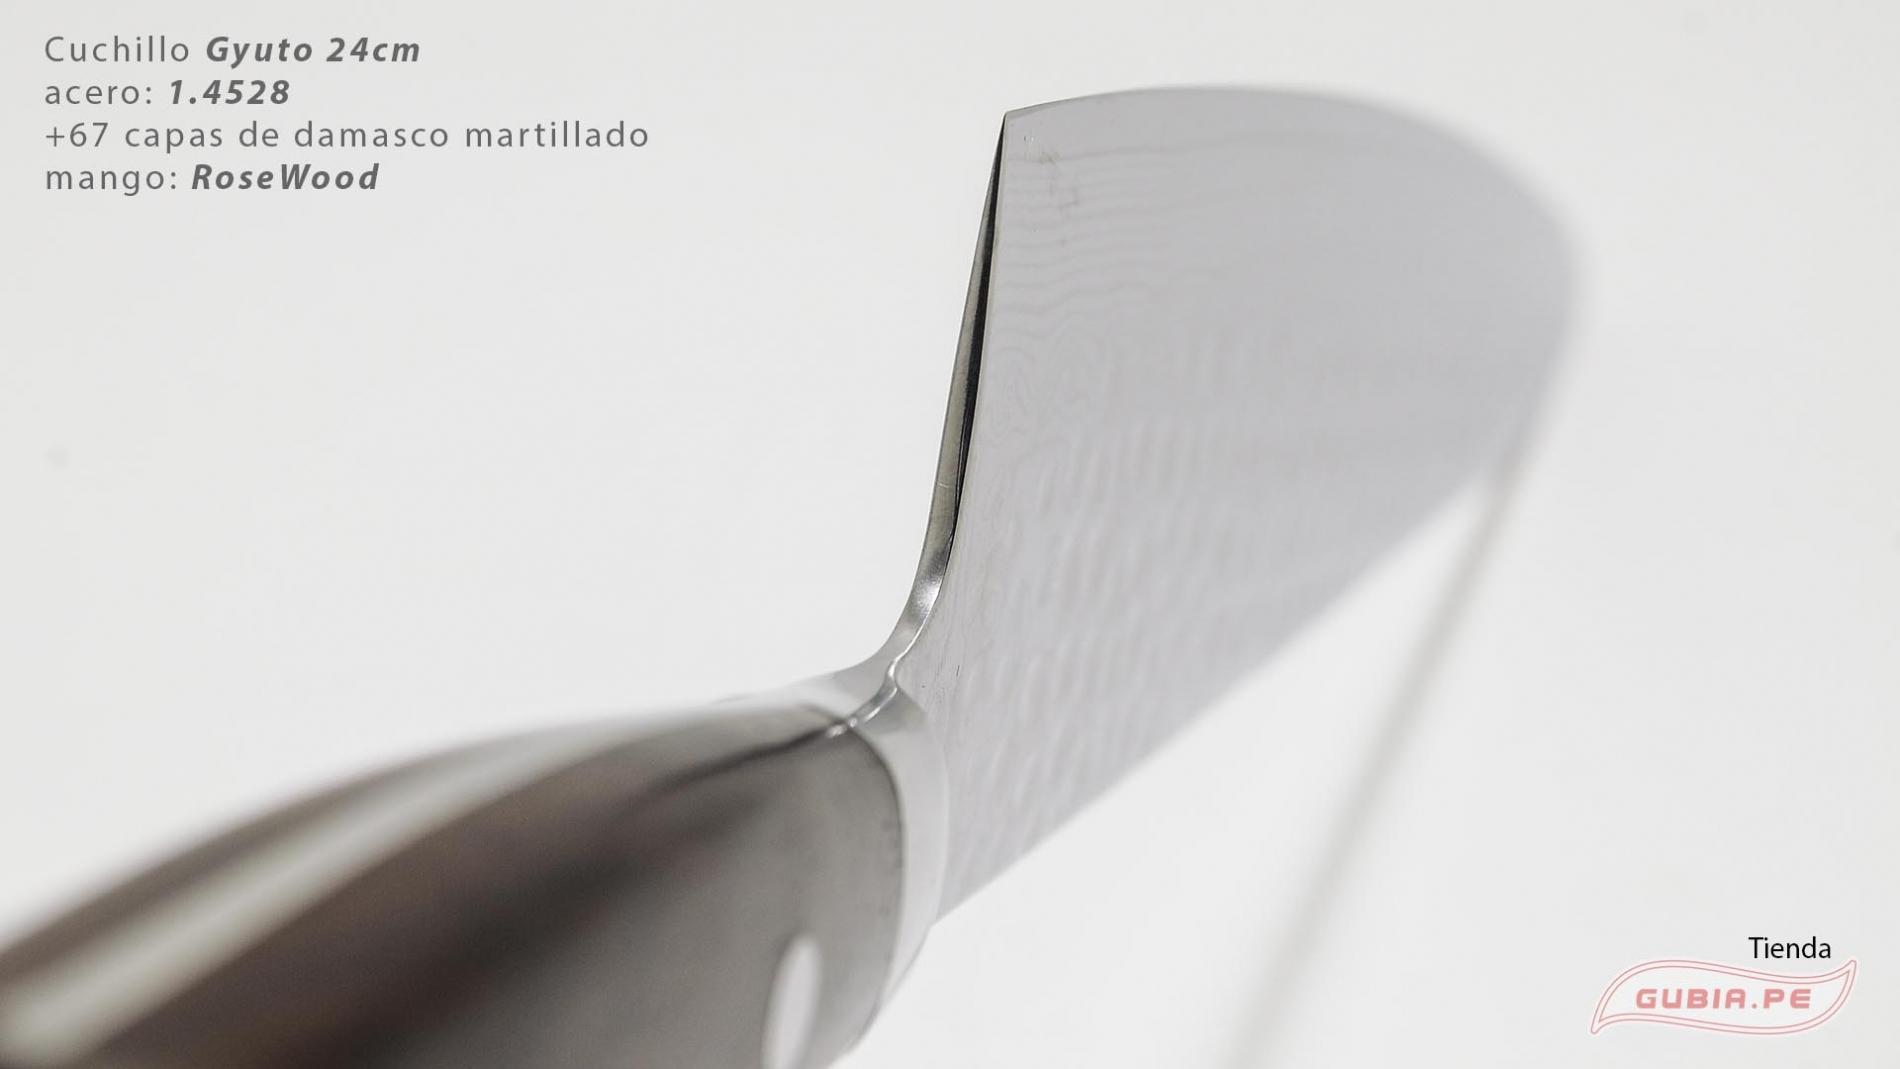 B9g24-Cuchillo Gyuto 24cm acero 1.4528+damasco Palo Rosa B9g24-max-4.